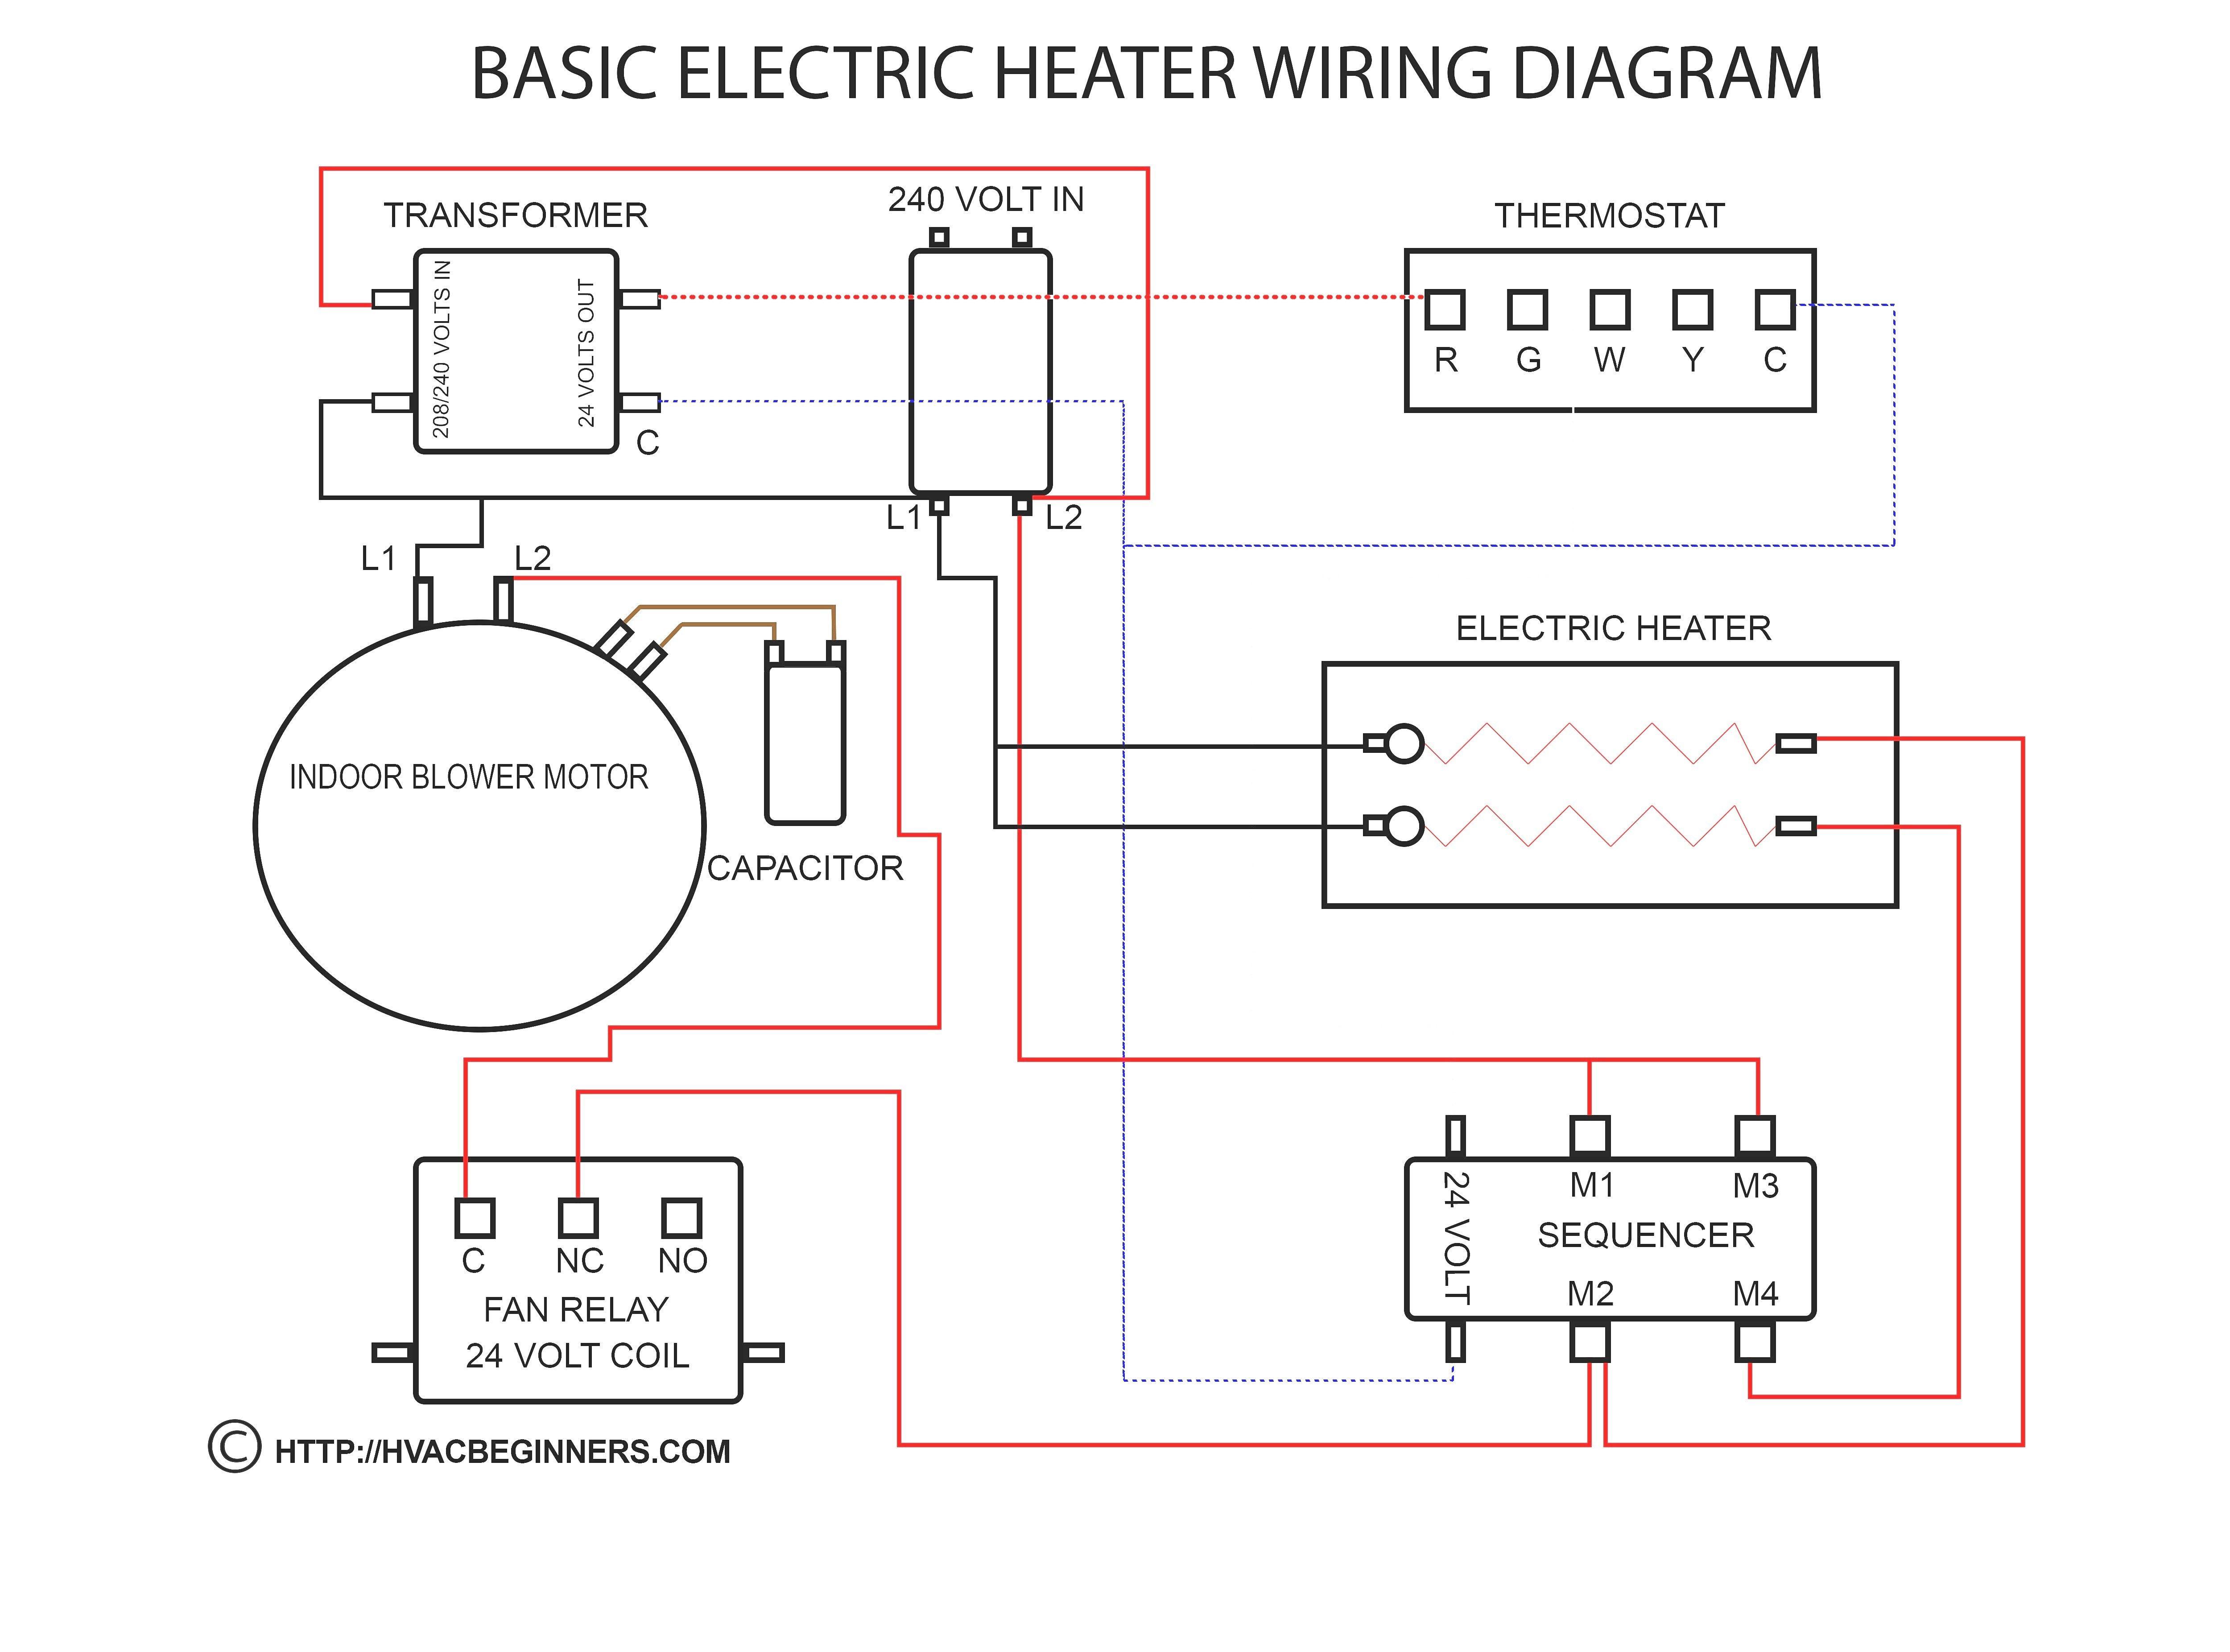 medium resolution of unique wiring circuit diagram diagram wiringdiagram diagramming diagramm visuals visualisation graphical